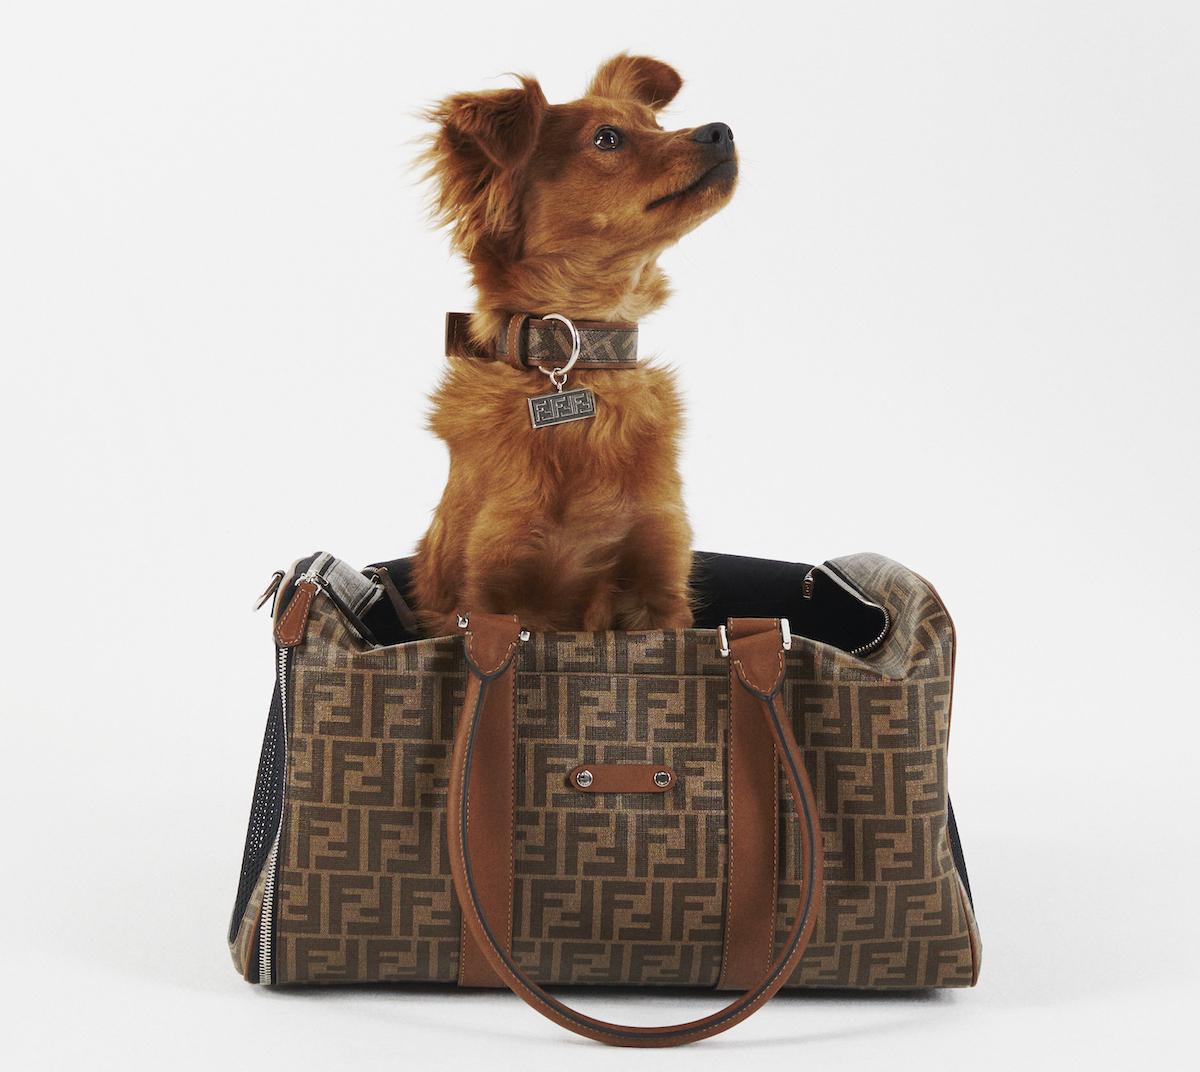 Fendi Unveil Monogram-Laden Pet Travel Collection